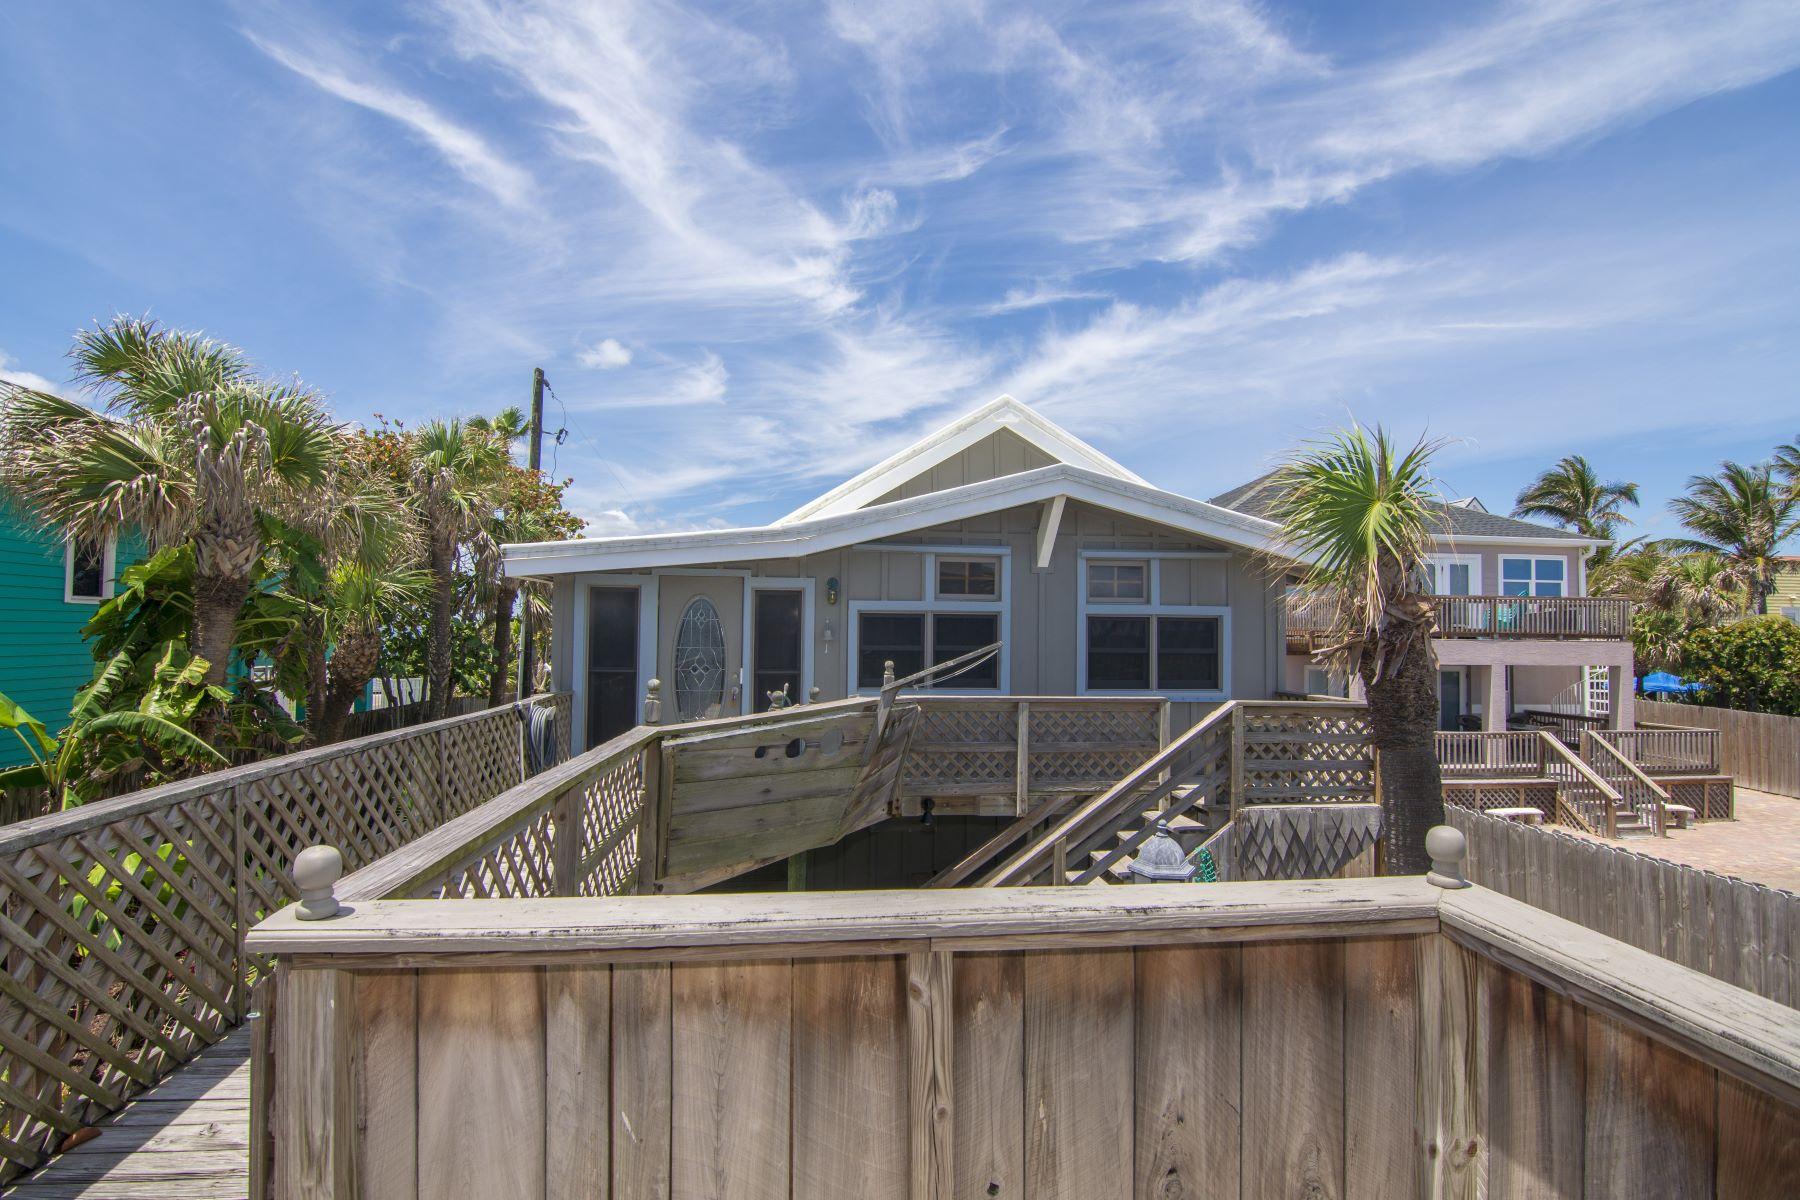 Single Family Homes για την Πώληση στο 12930 Highway A1a, Vero Beach, FL 12930 Highway A1a Vero Beach, Φλοριντα 32963 Ηνωμένες Πολιτείες